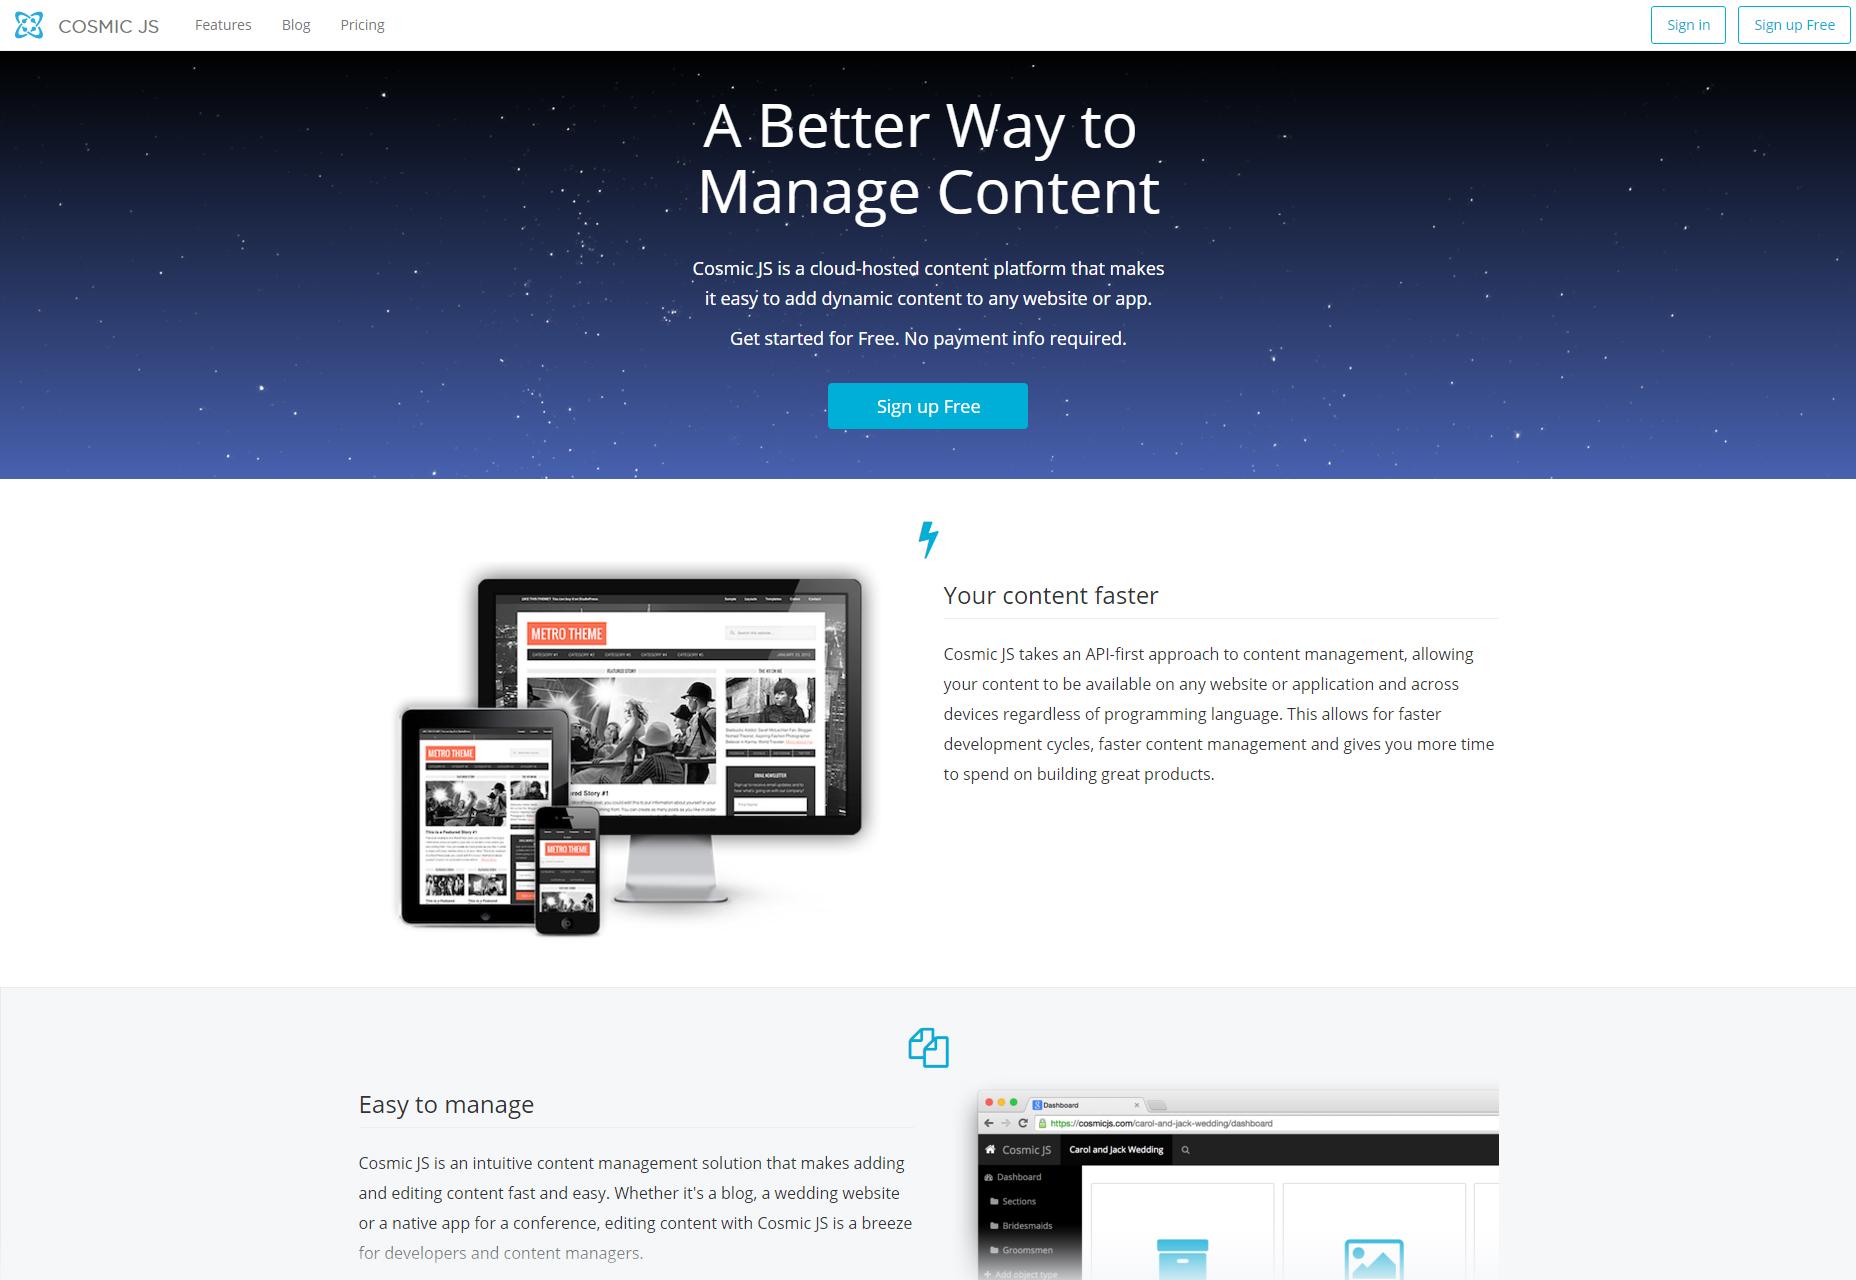 CosmicJS: Cloud-Hosted Content Management Platform